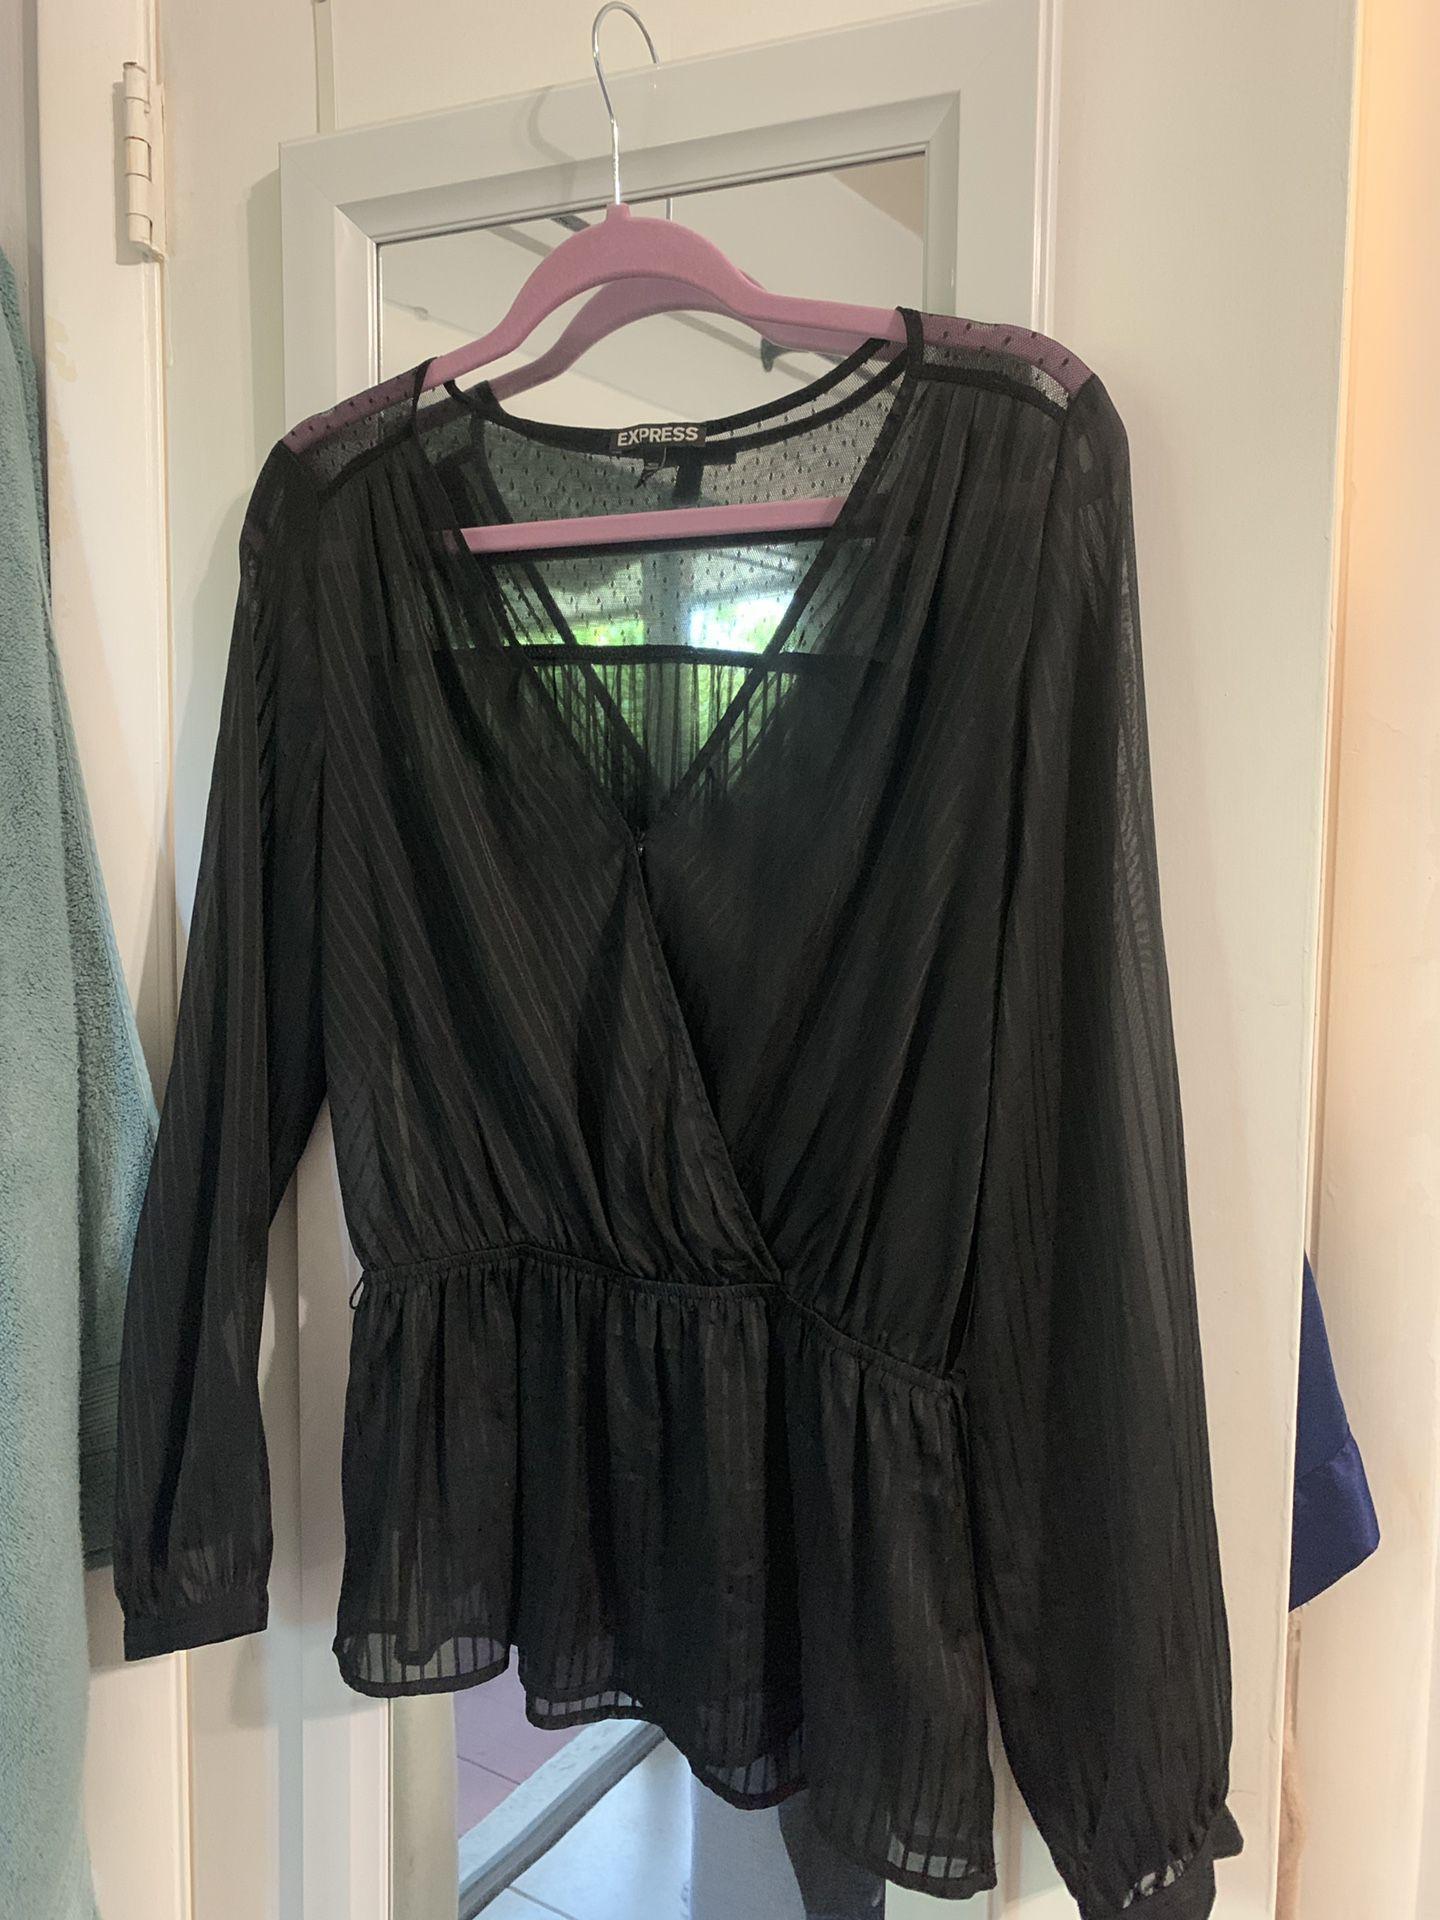 Express faux wrap tie front sheer blouse - M